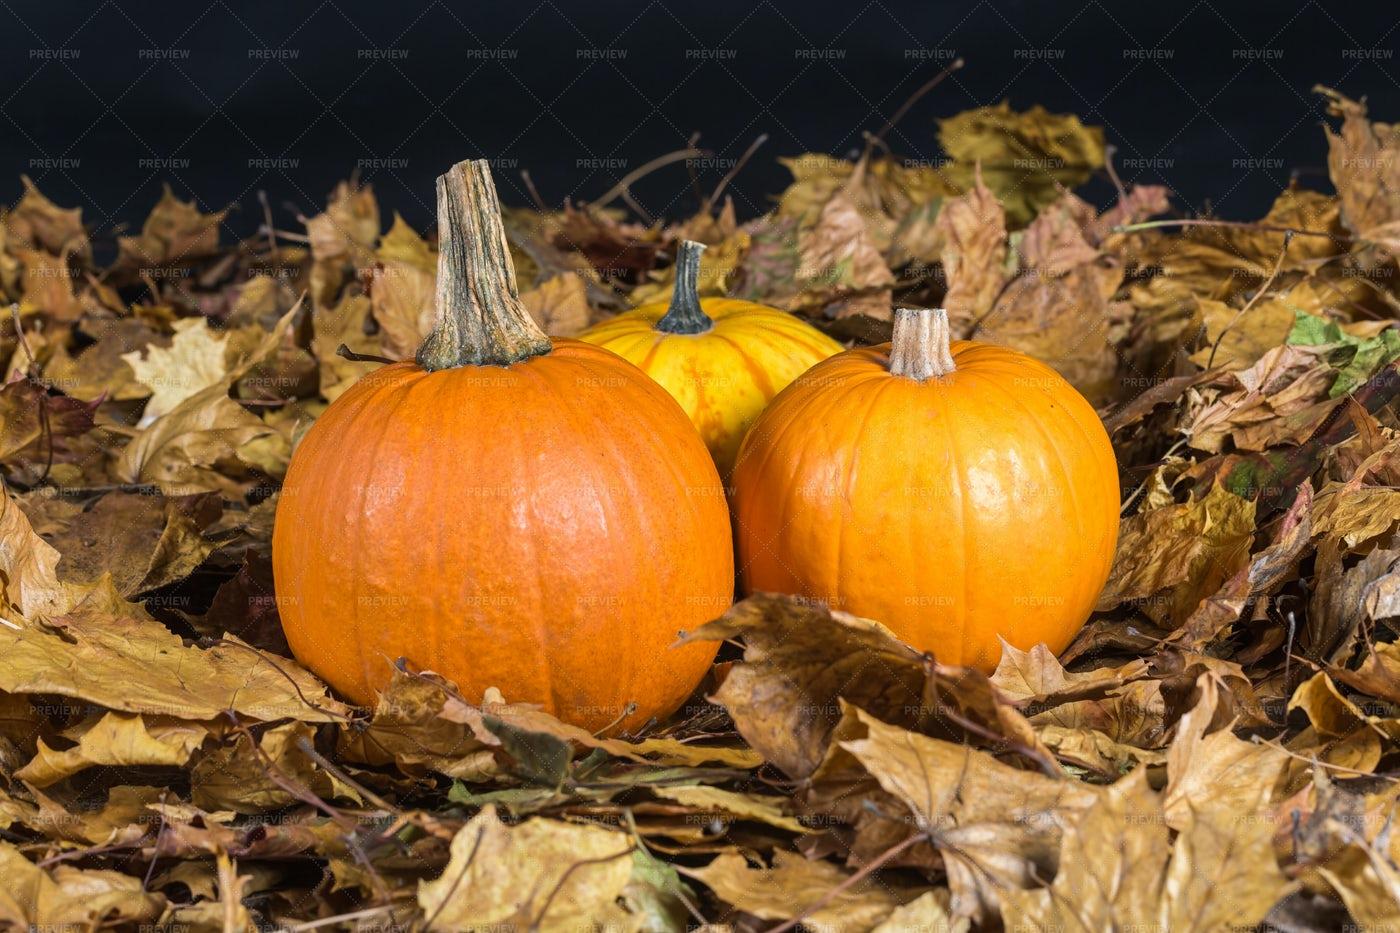 Pumpkins On Oak Leaves: Stock Photos